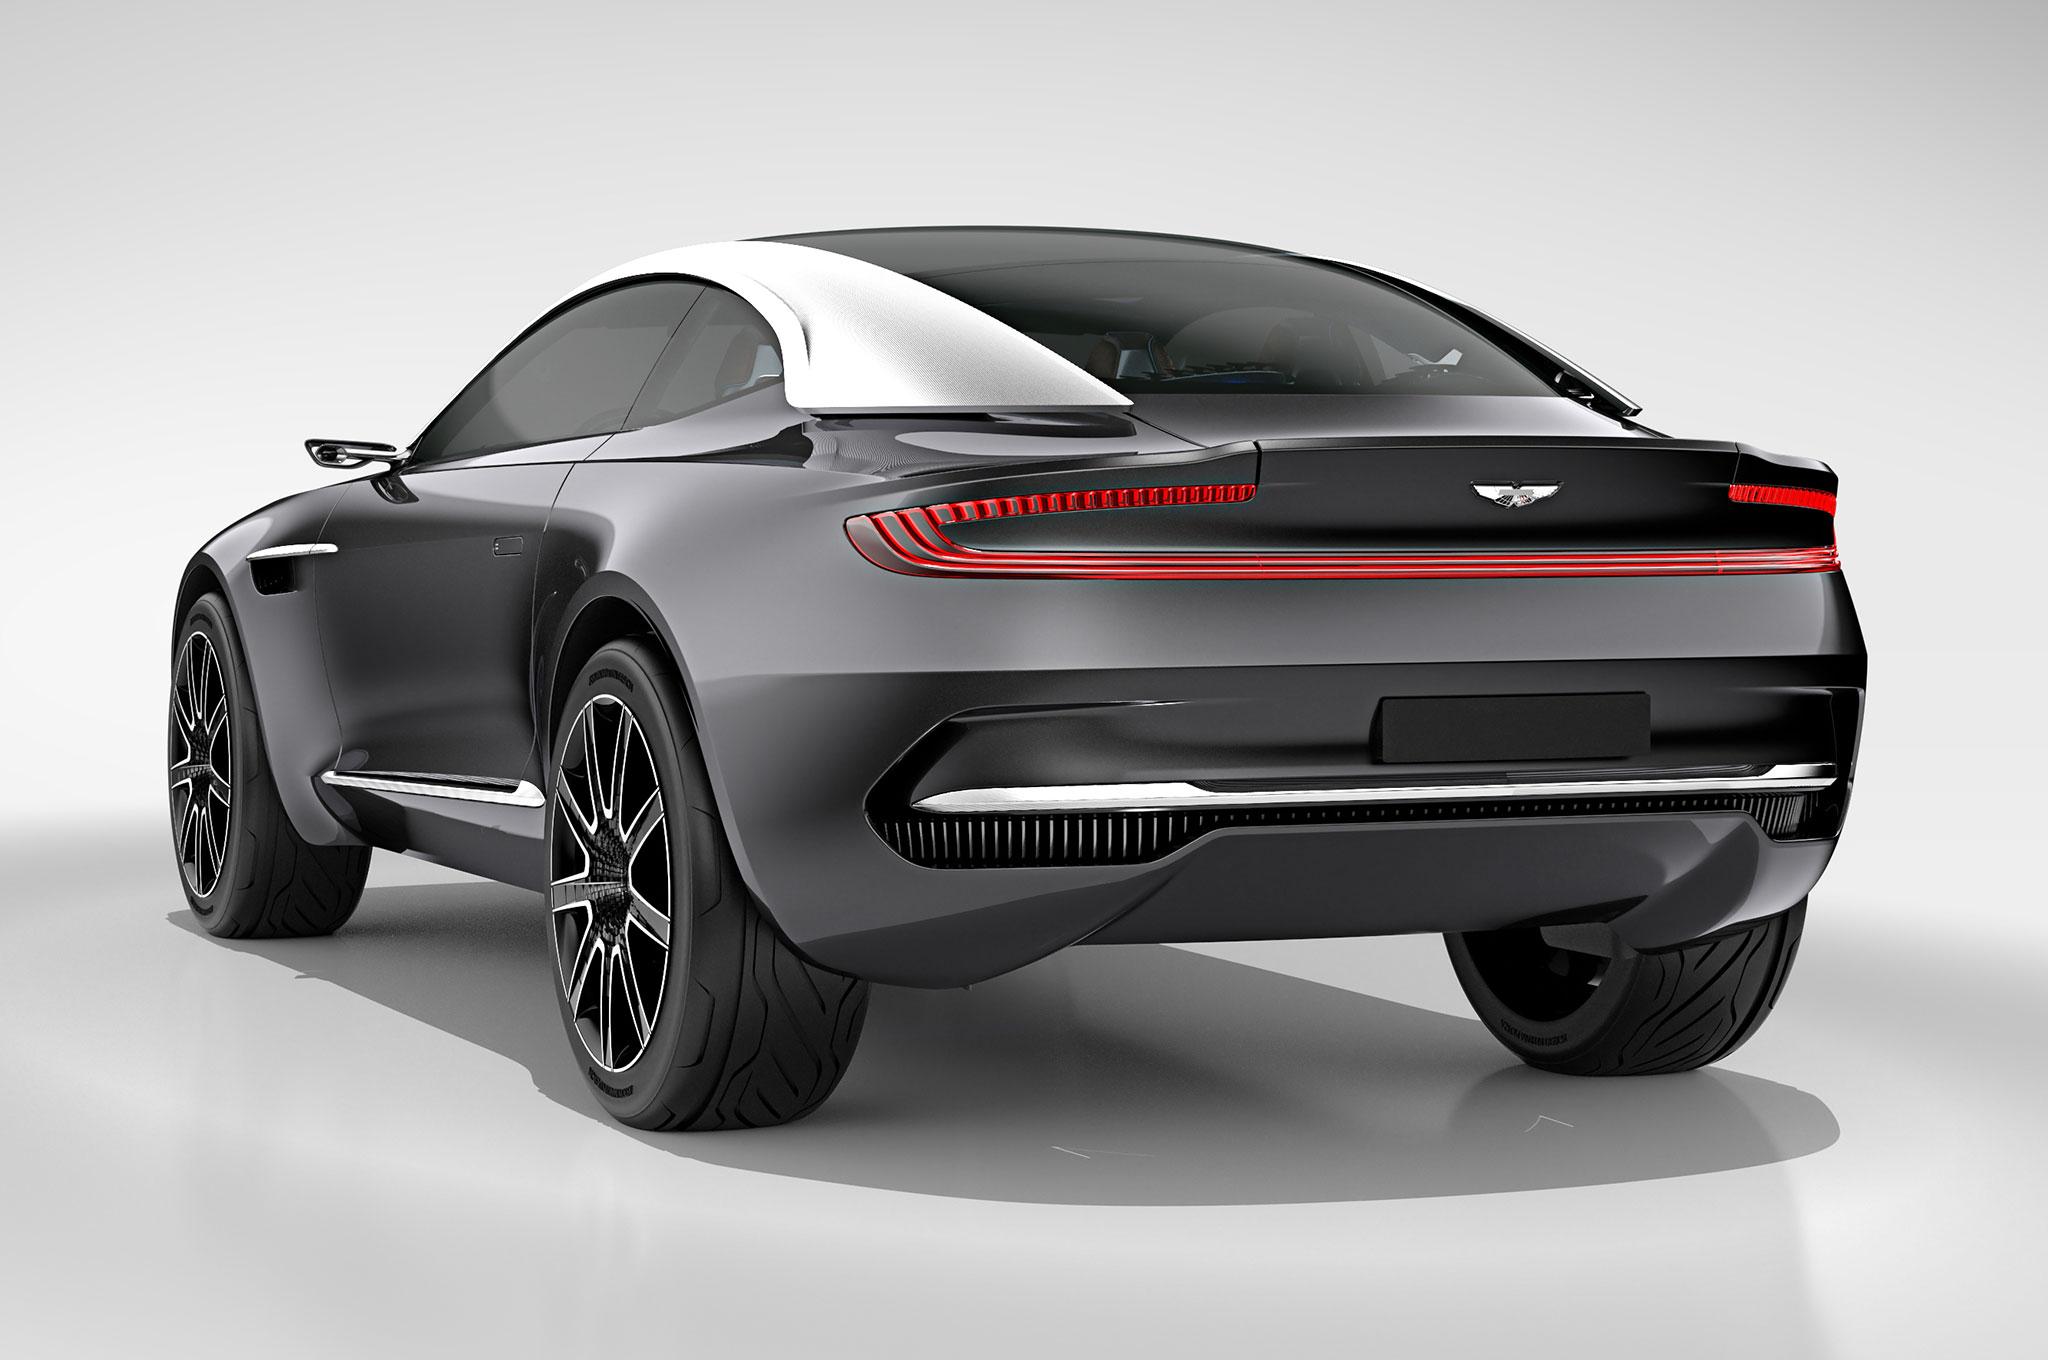 Aston Martin Confirms $305 Million Investment to Build DBX ...